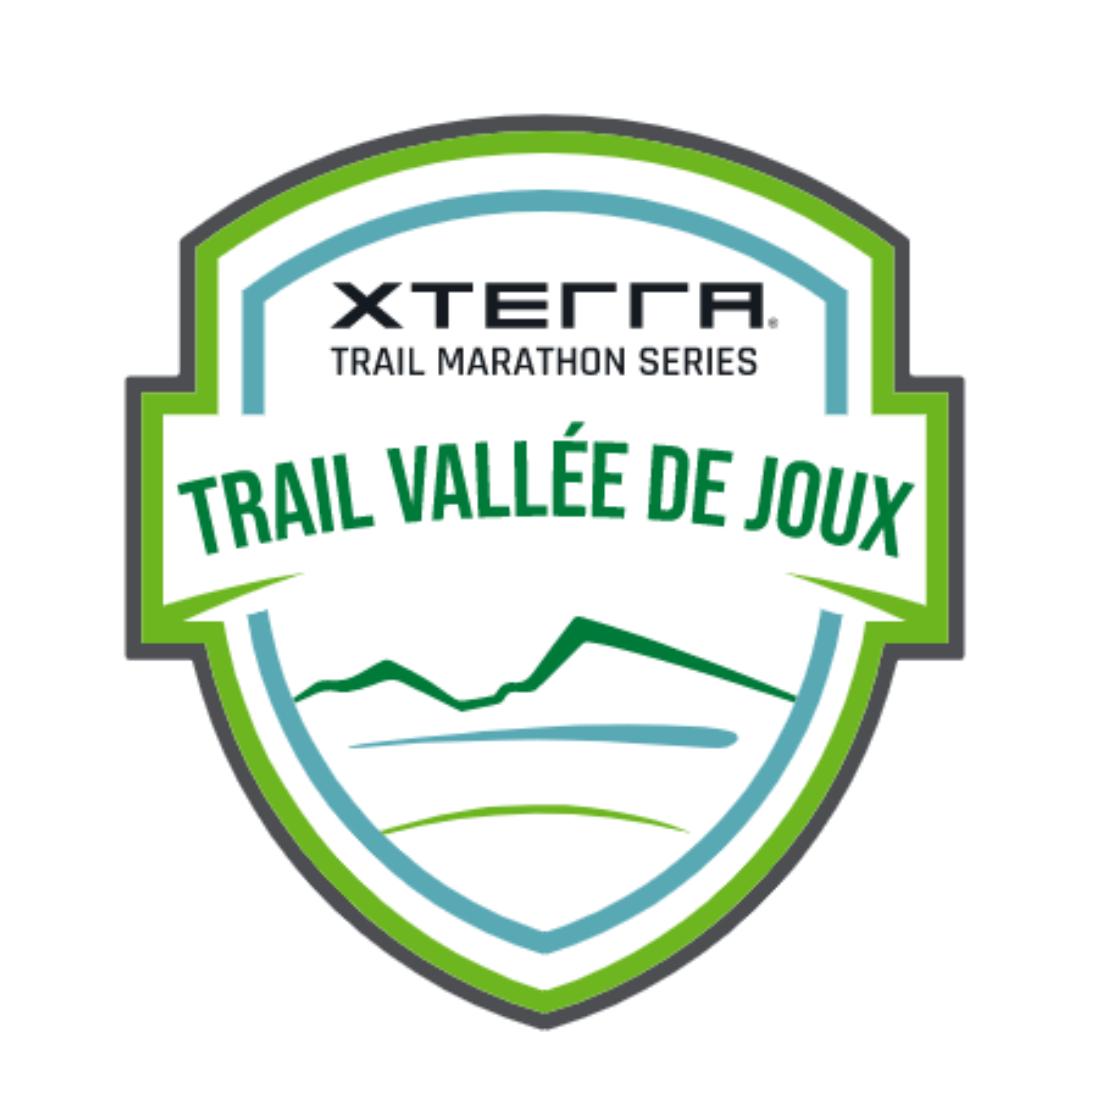 Logo-Trail-Vallée-de-Joux-Xterra